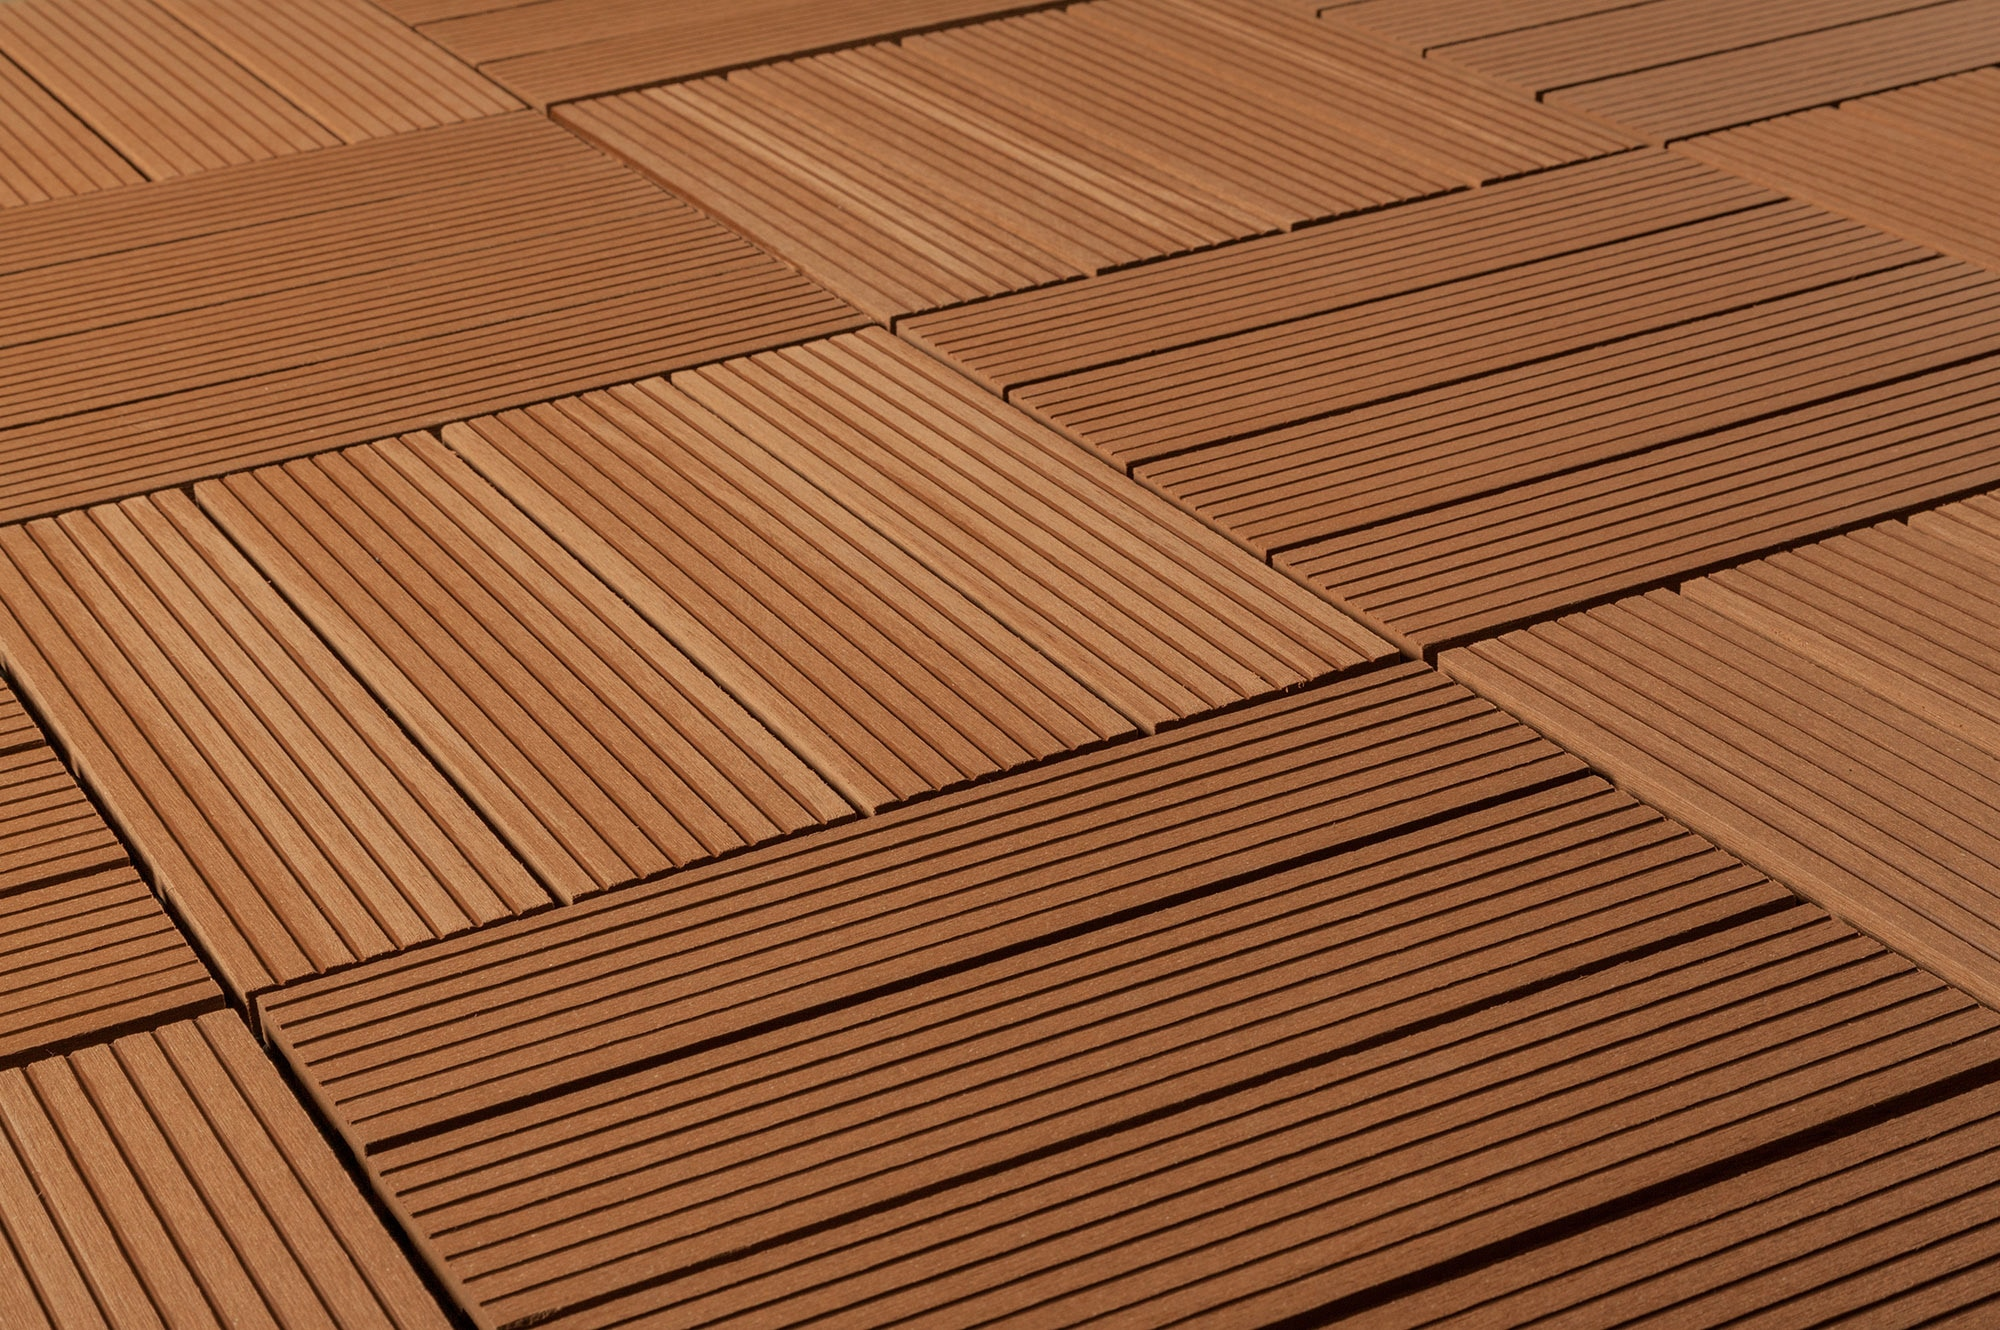 12x12 wood deck materials bing images. Black Bedroom Furniture Sets. Home Design Ideas